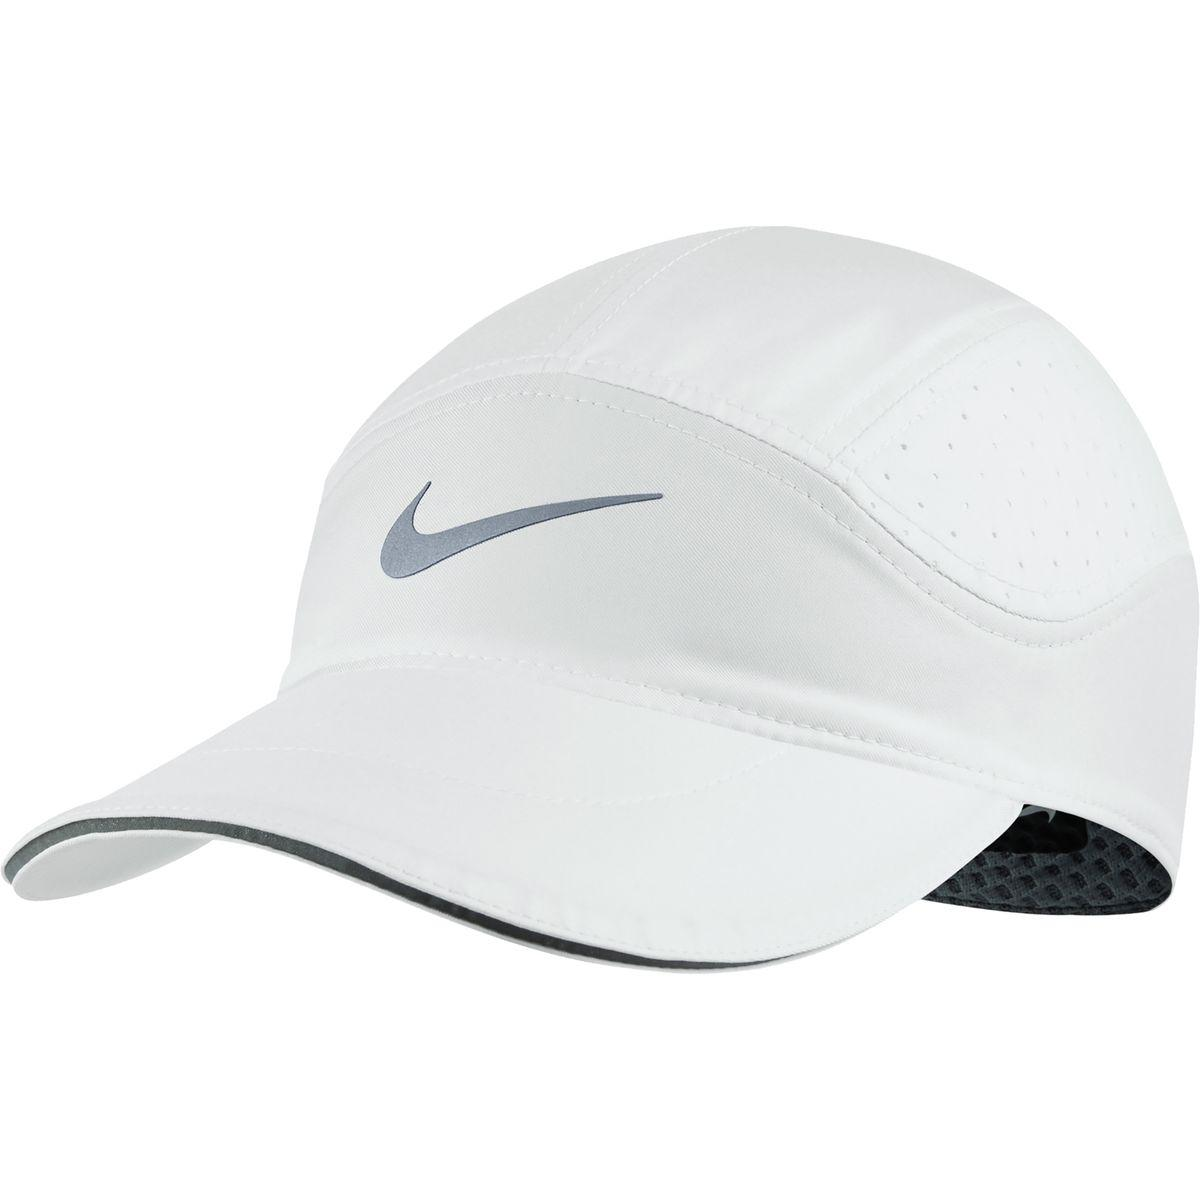 9a7bd8dffb6ba Lyst - Nike Aerobill Elite Running Hat in White for Men